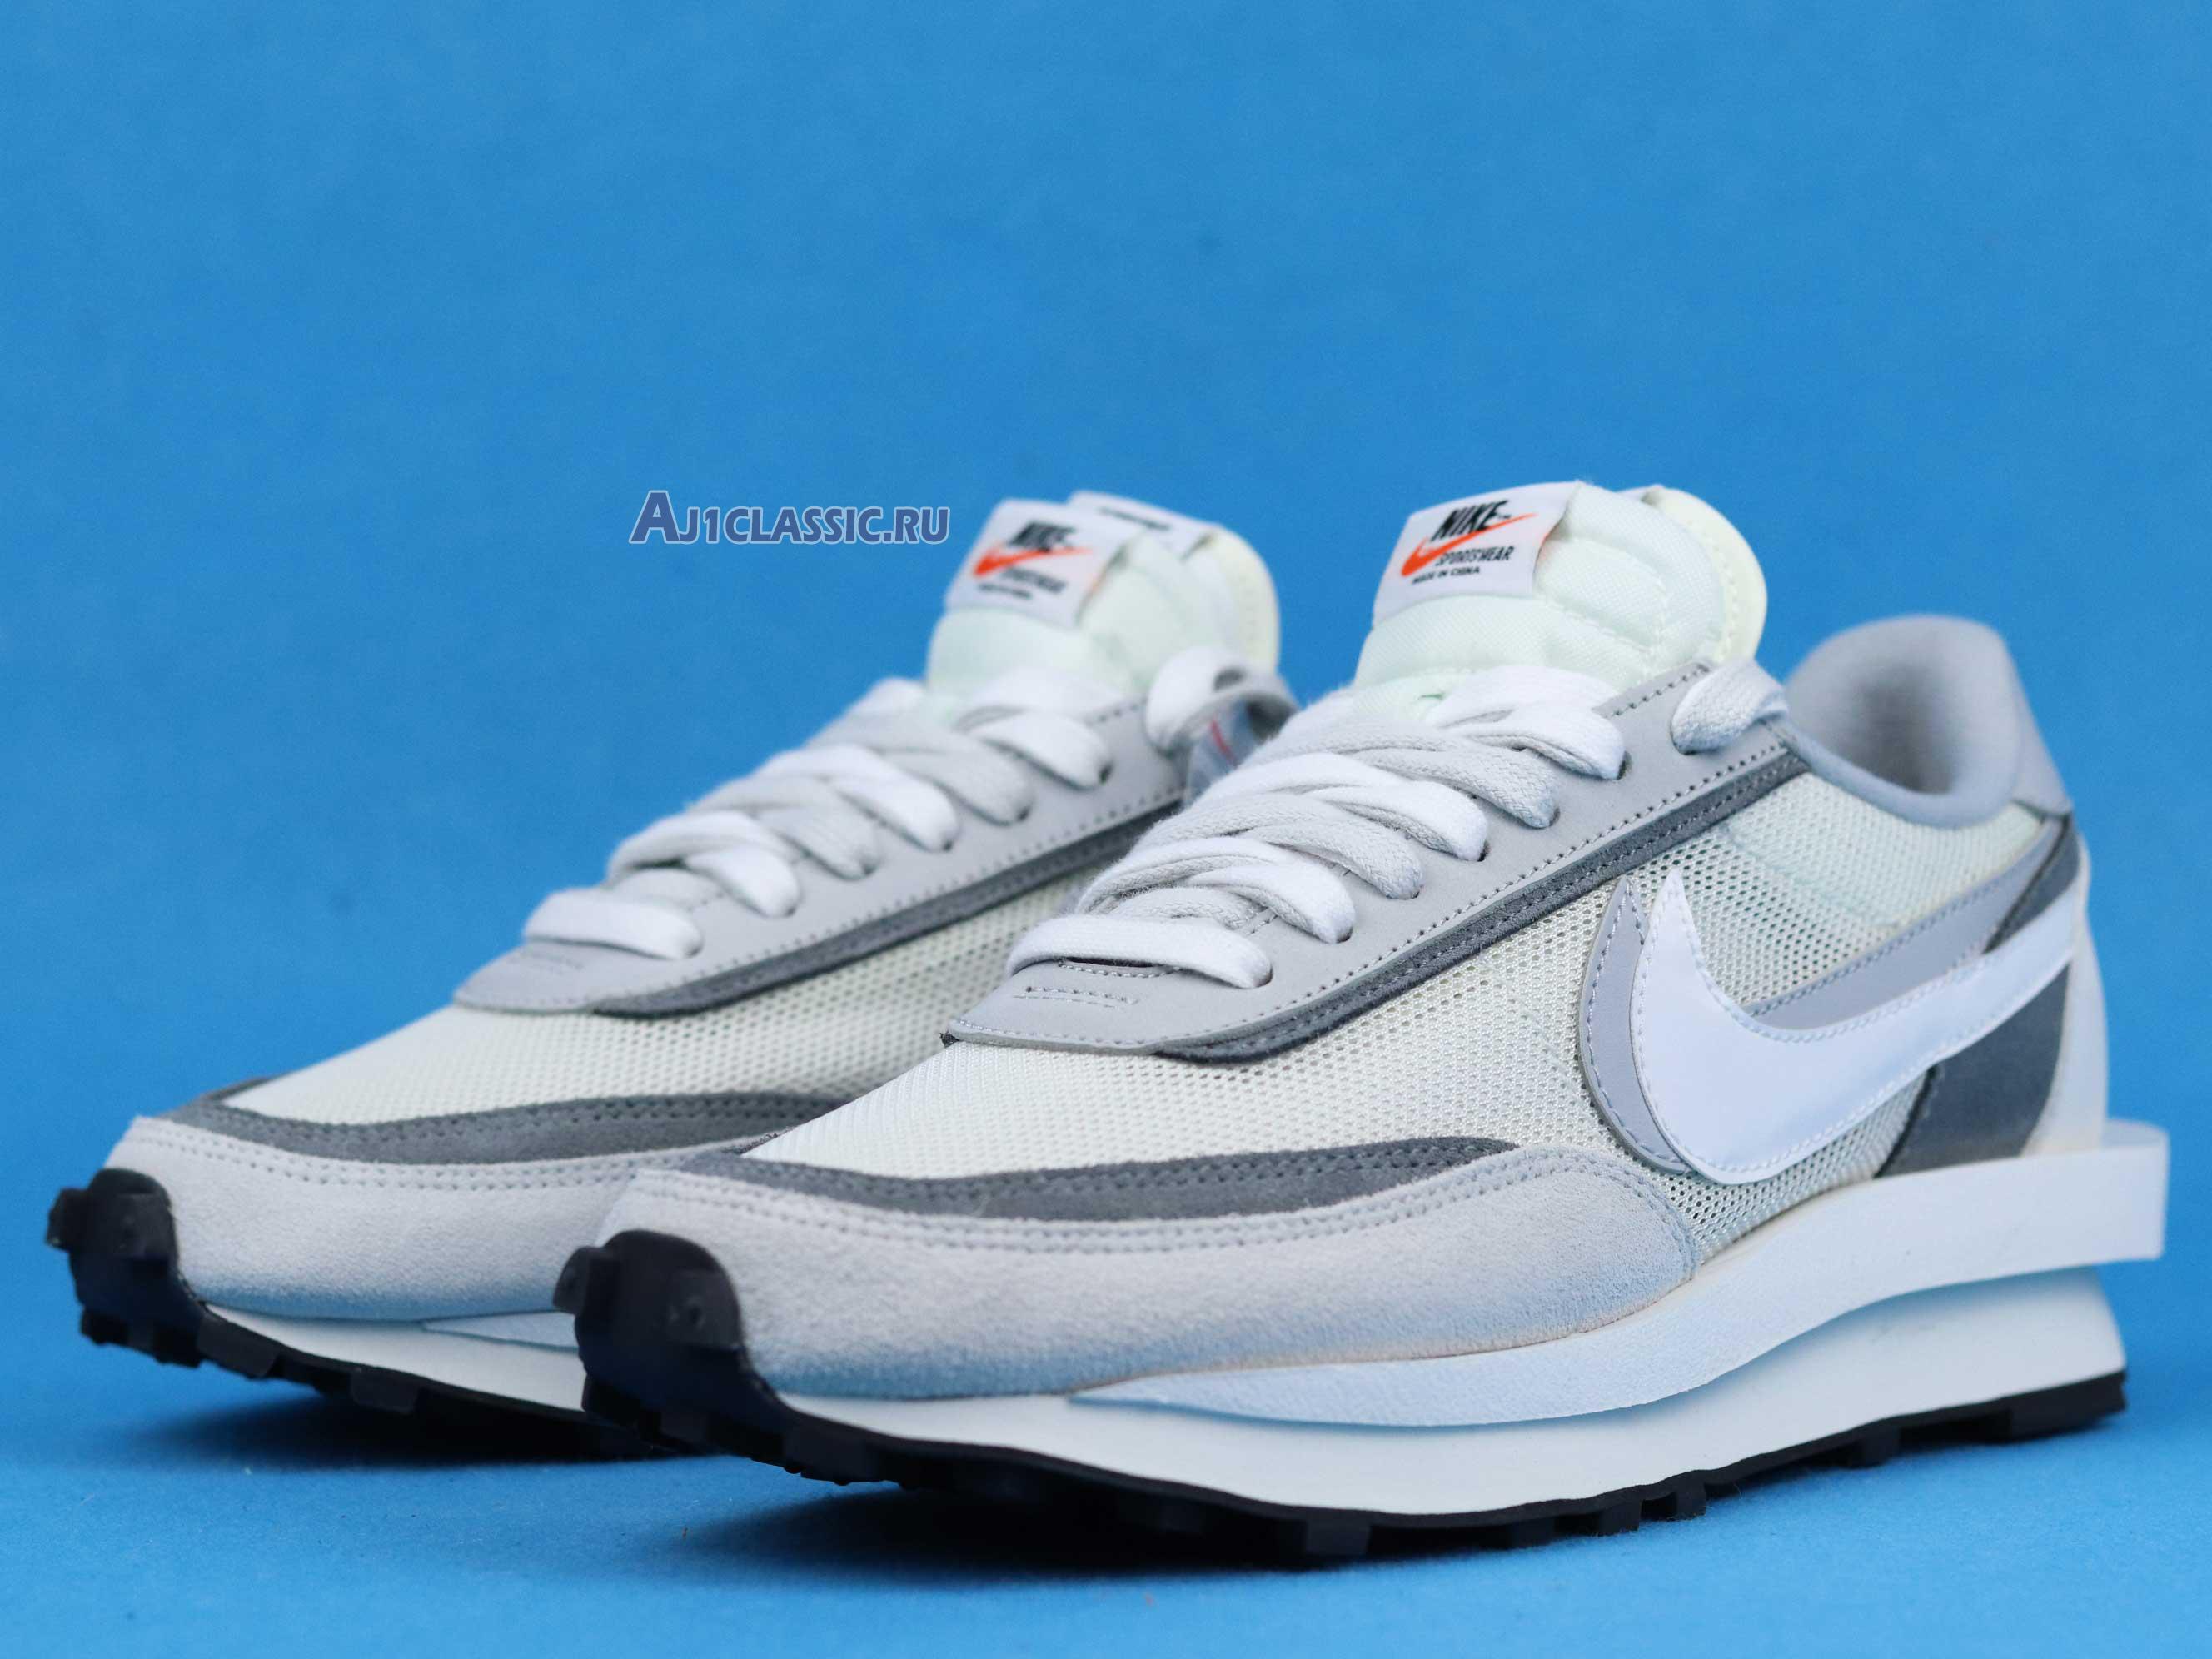 "Sacai x Nike LDWaffle ""Summit White"" BV0073-100"